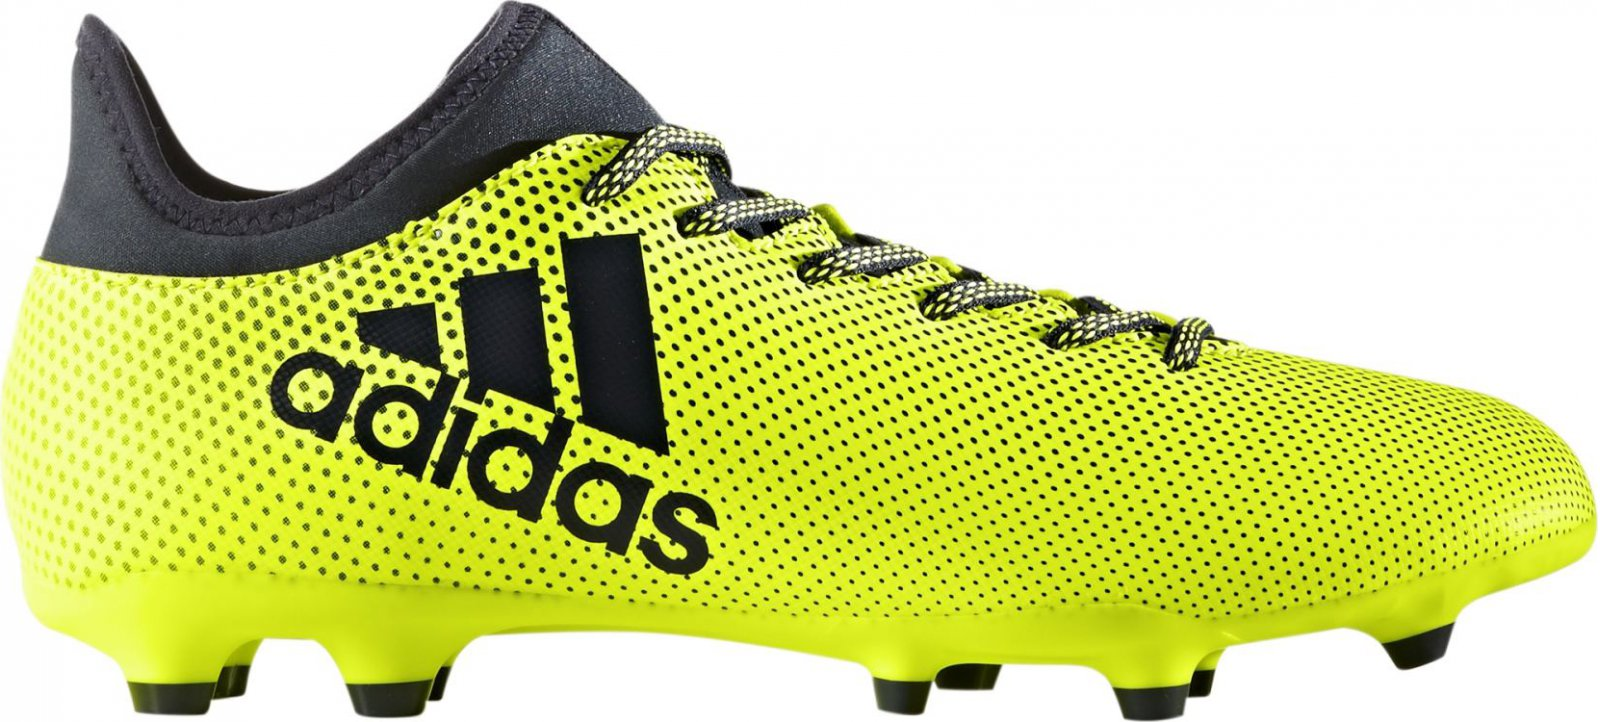 0c7e0d77370 Adidas X 17.3 FG žluté od 859 Kč • Zboží.cz